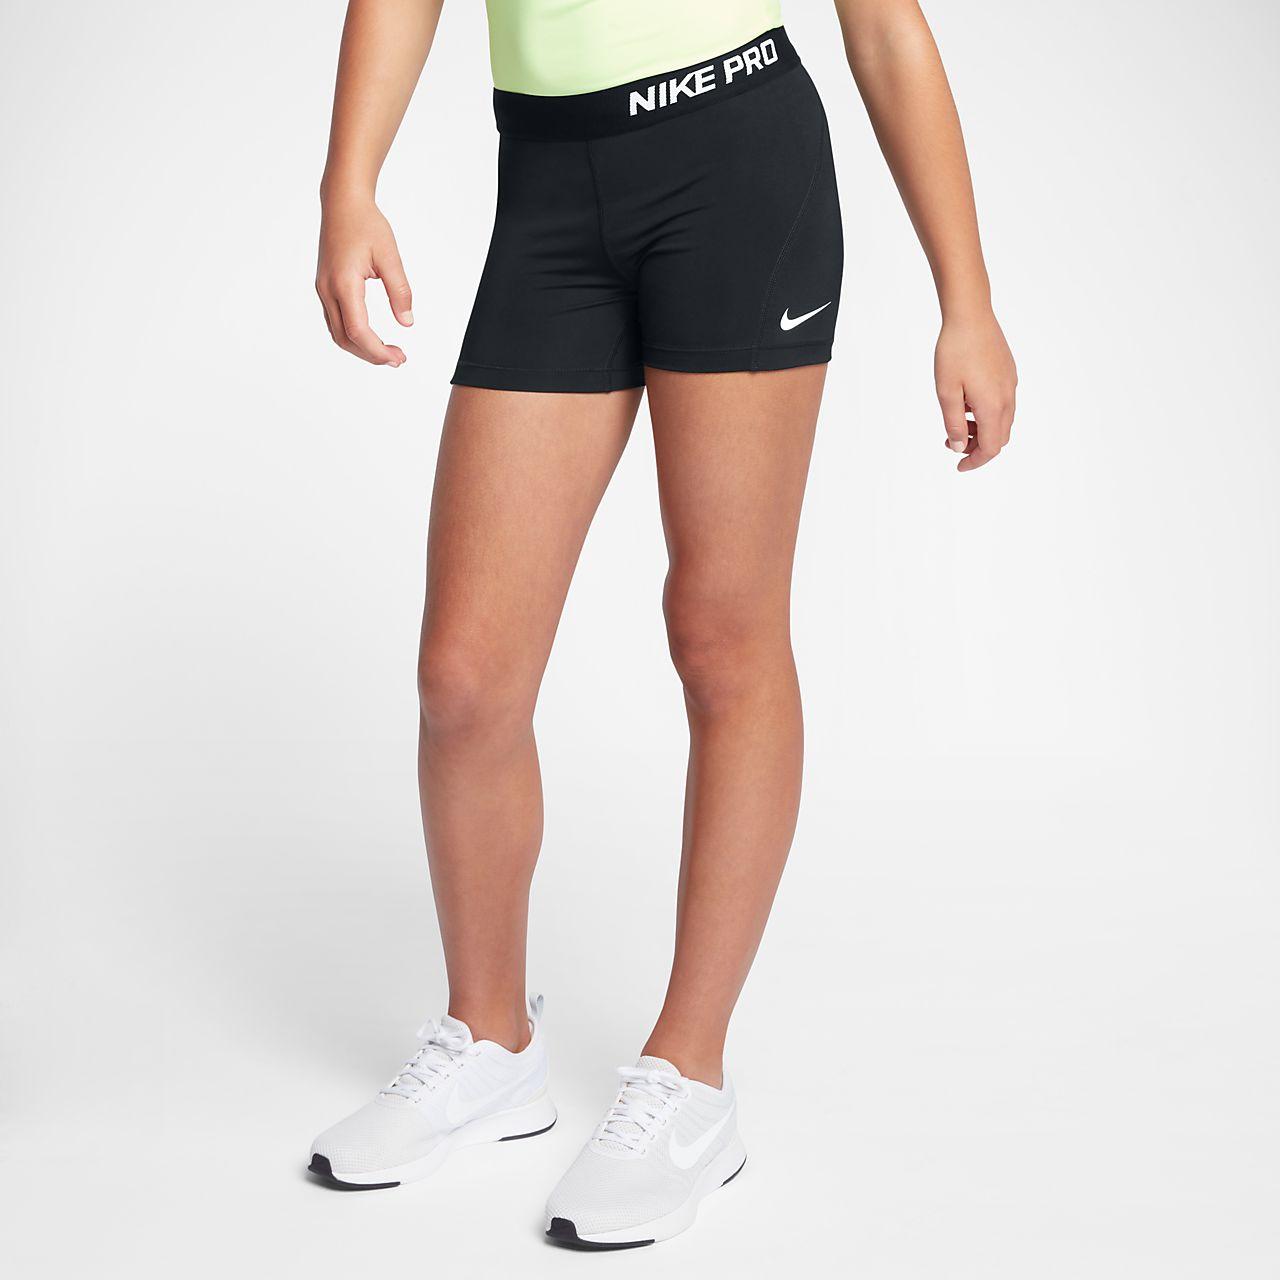 Nike Pro Trainingsshorts (ca. 10 cm) für ältere Kinder (Mädchen)